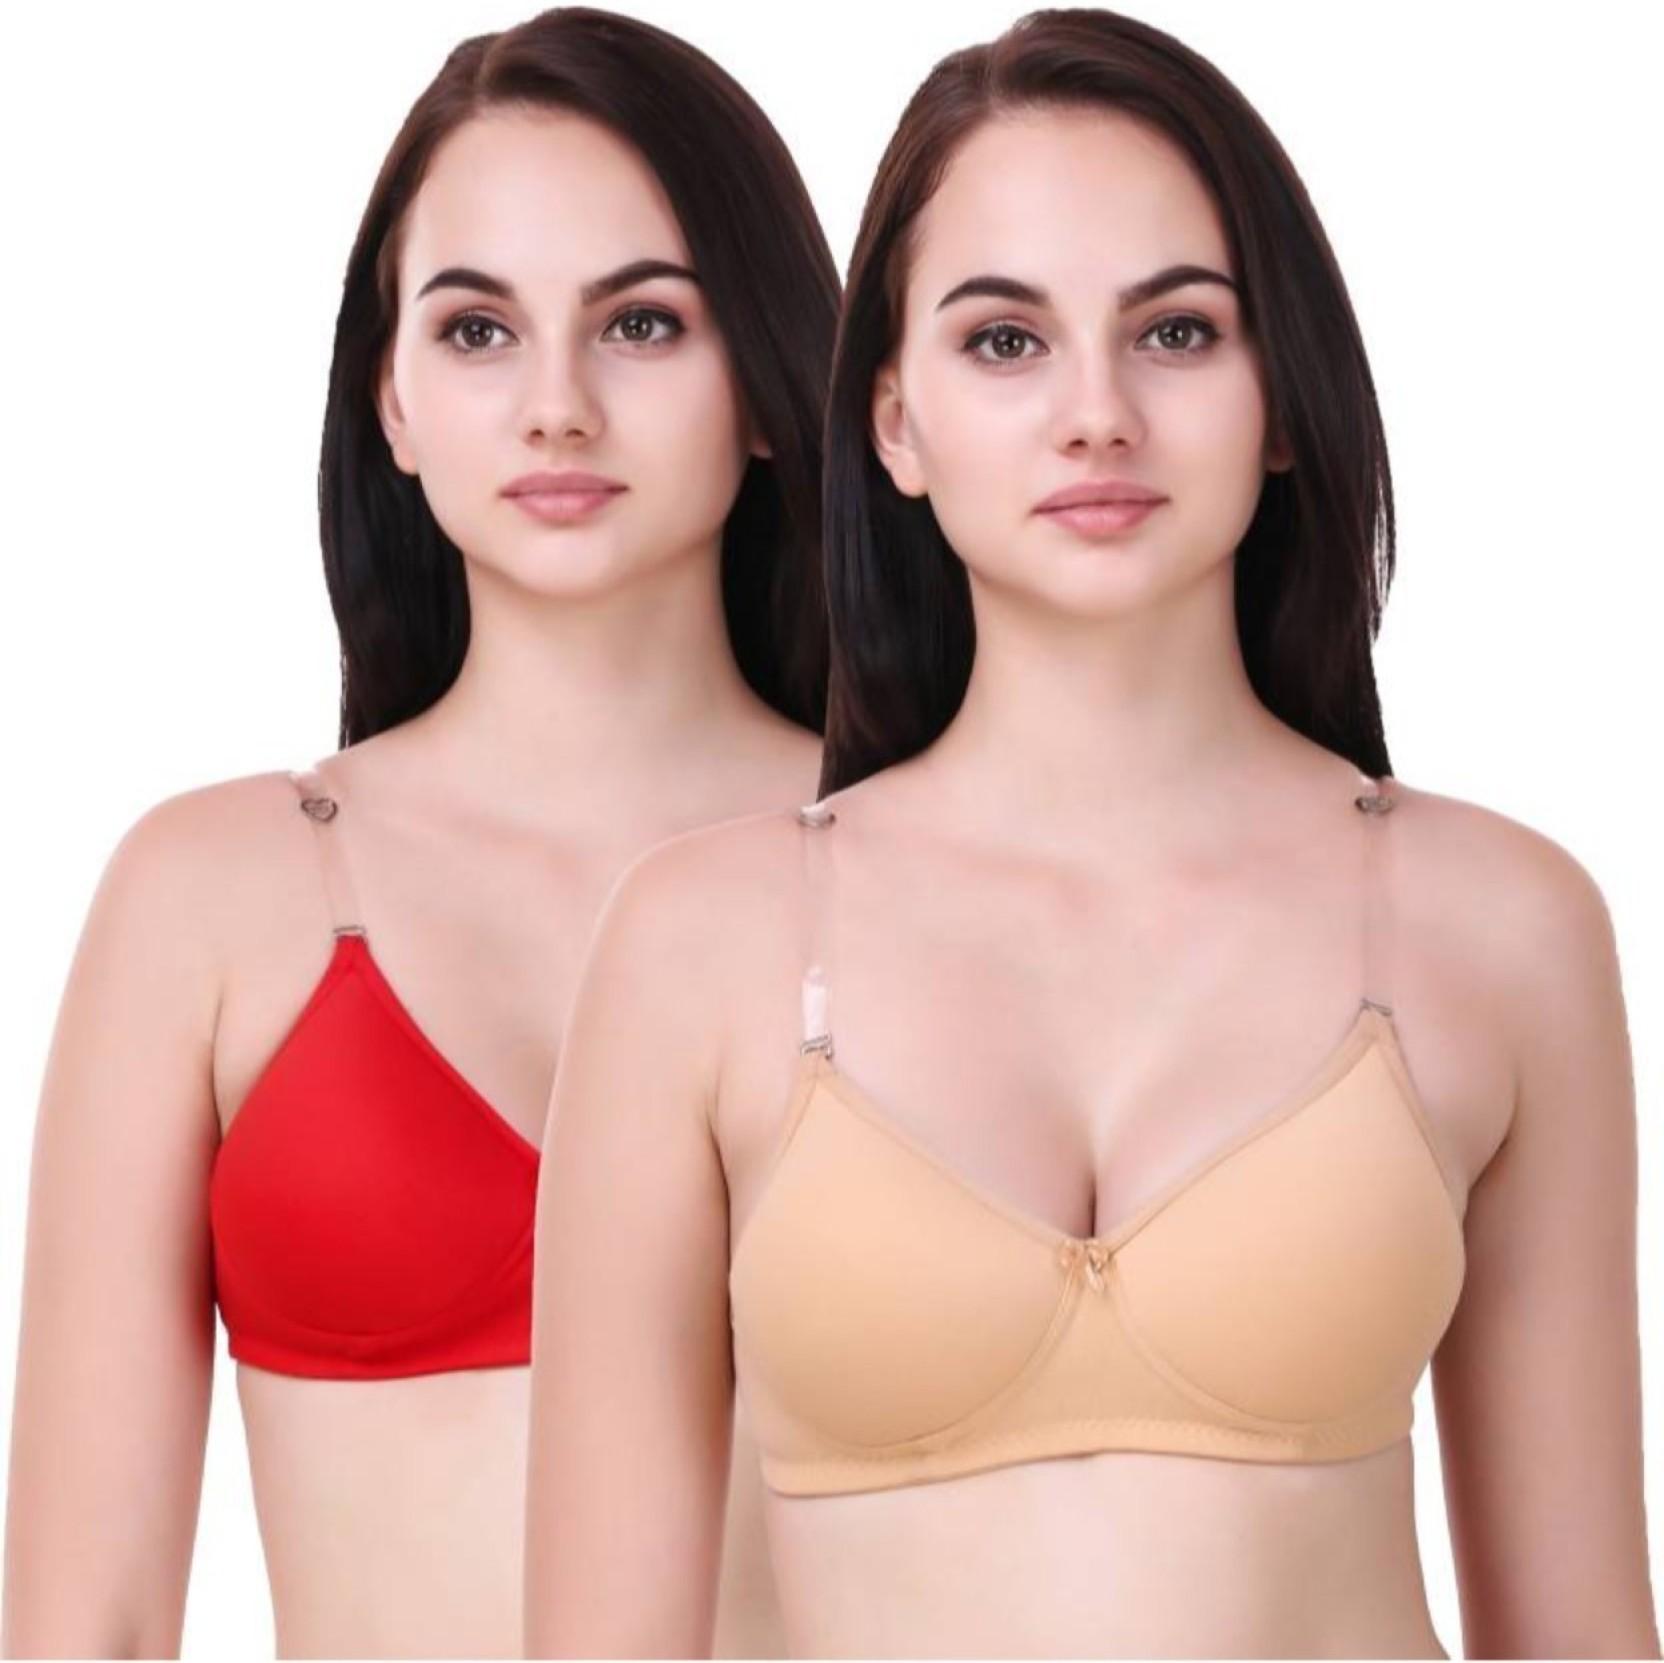 ae58356ed0 Apraa byApraa   Parma transparent strap bra Women Full Coverage Lightly  Padded Bra (Red)